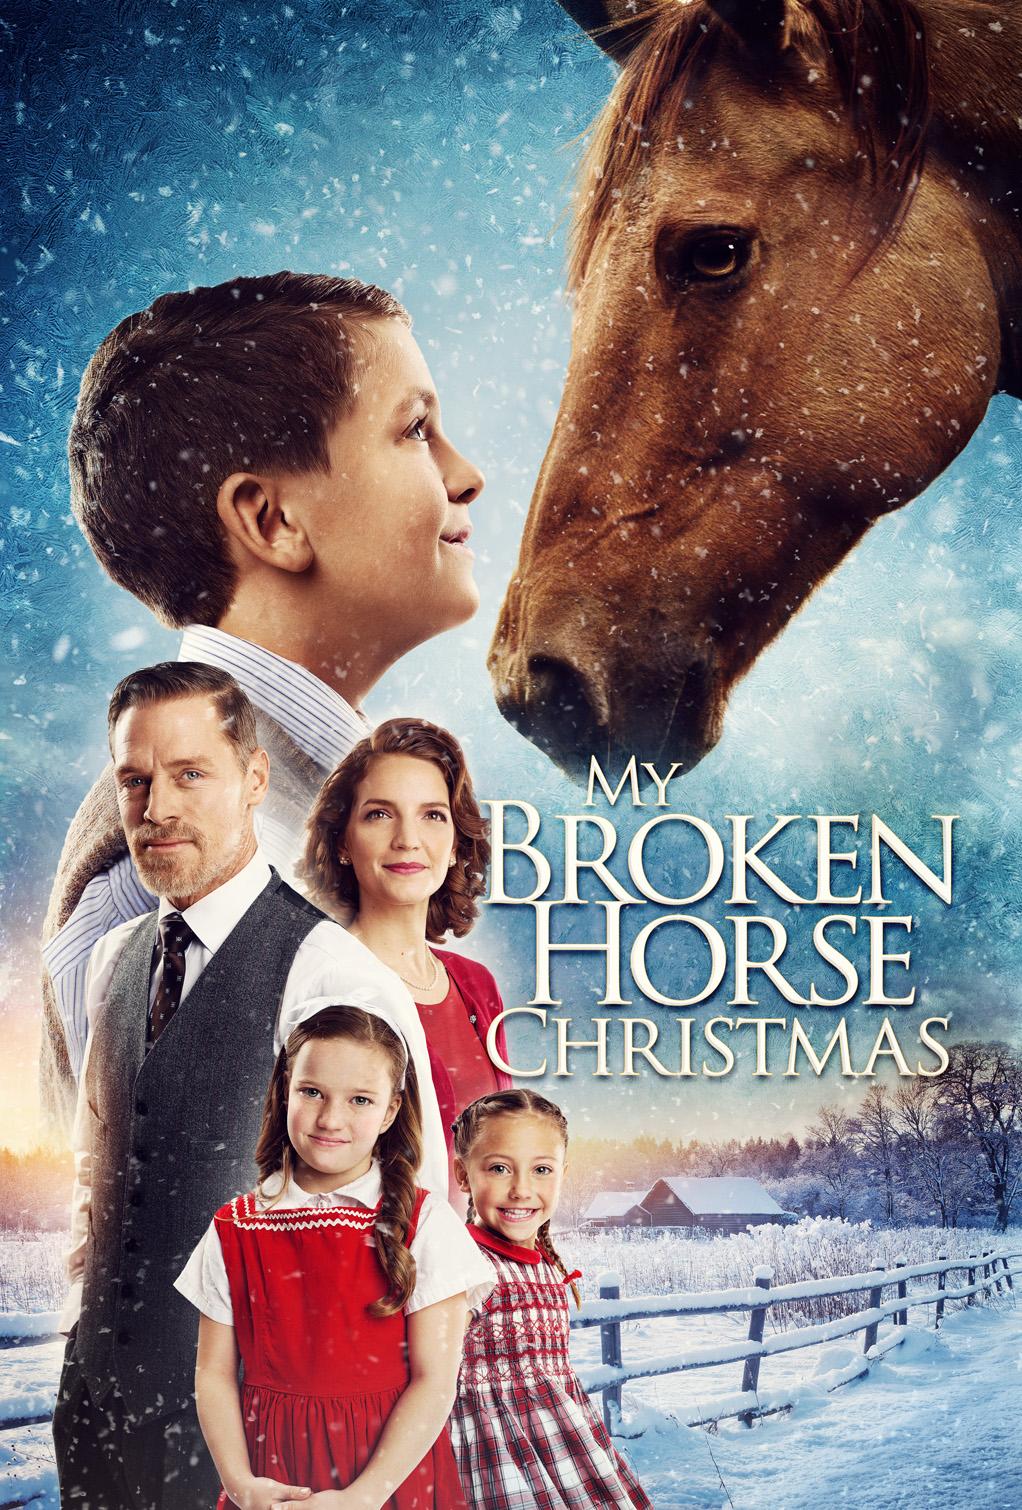 my broken horse christmas 2017 imdb - Horse Christmas